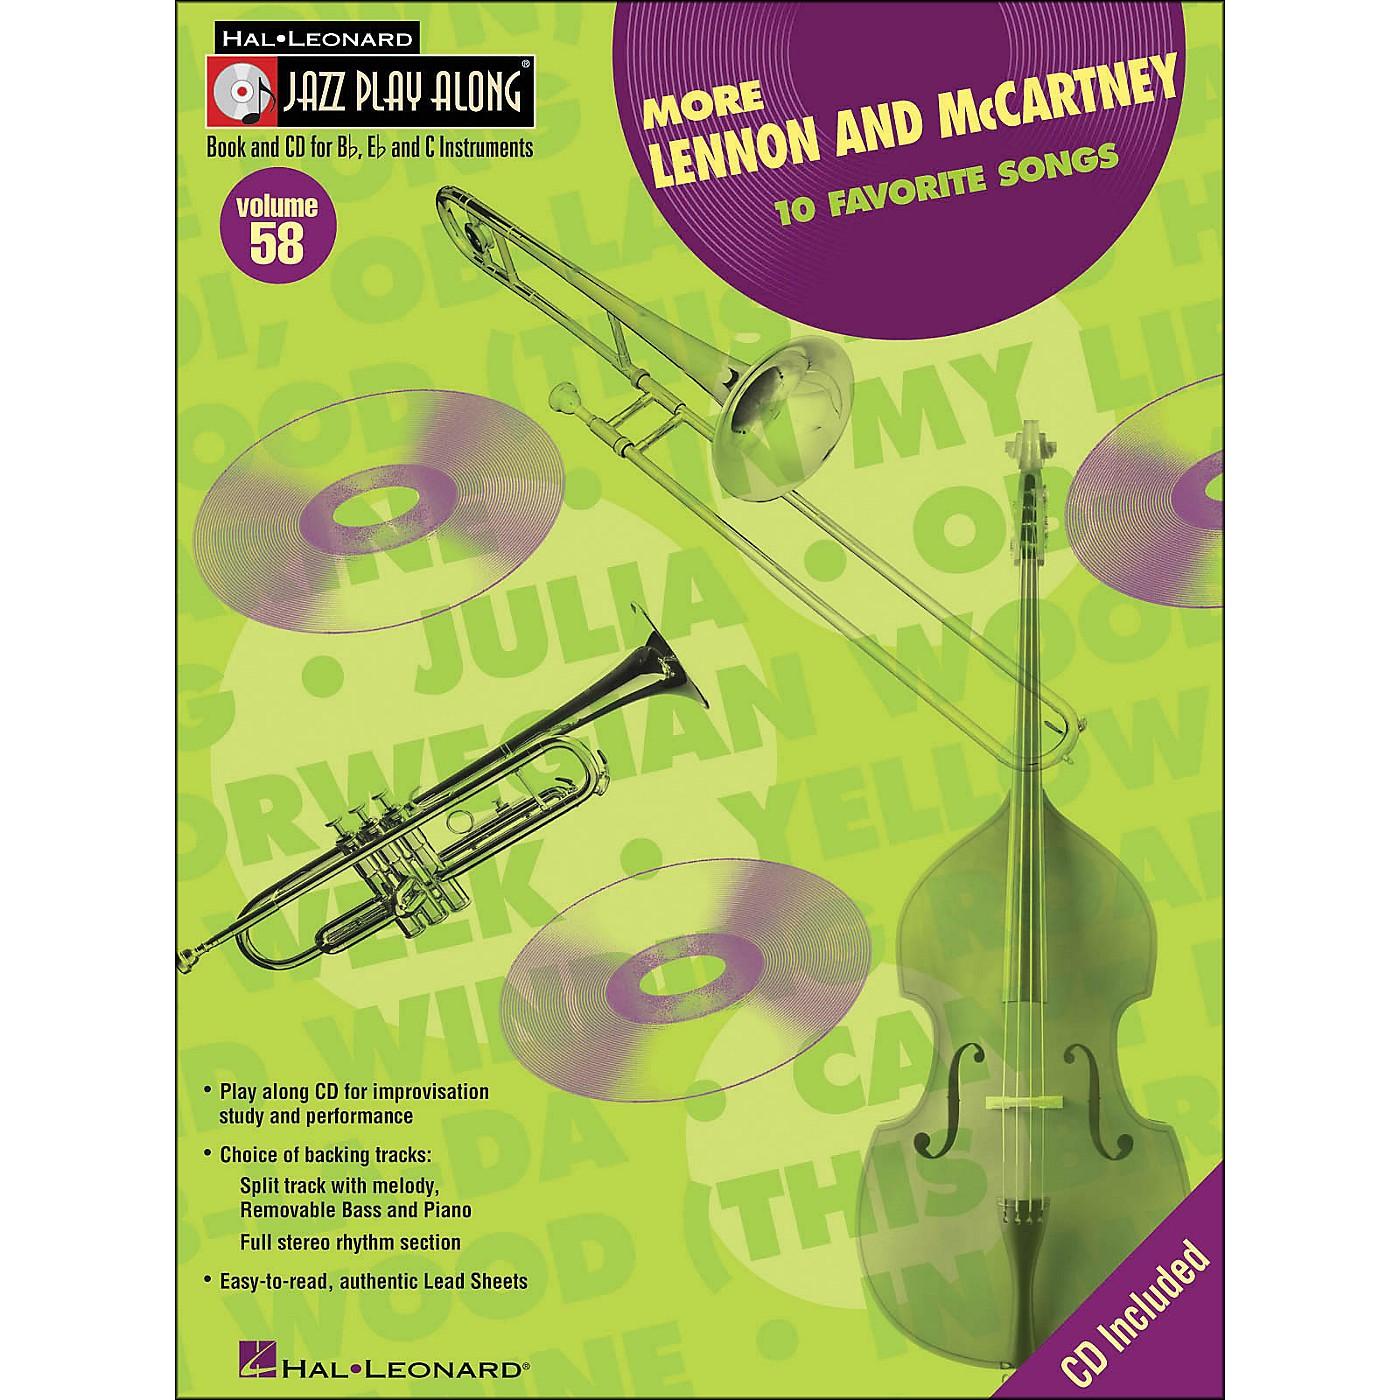 Hal Leonard More Lennon & McCartney Volume 58 Book/CD Jazz Play Along thumbnail